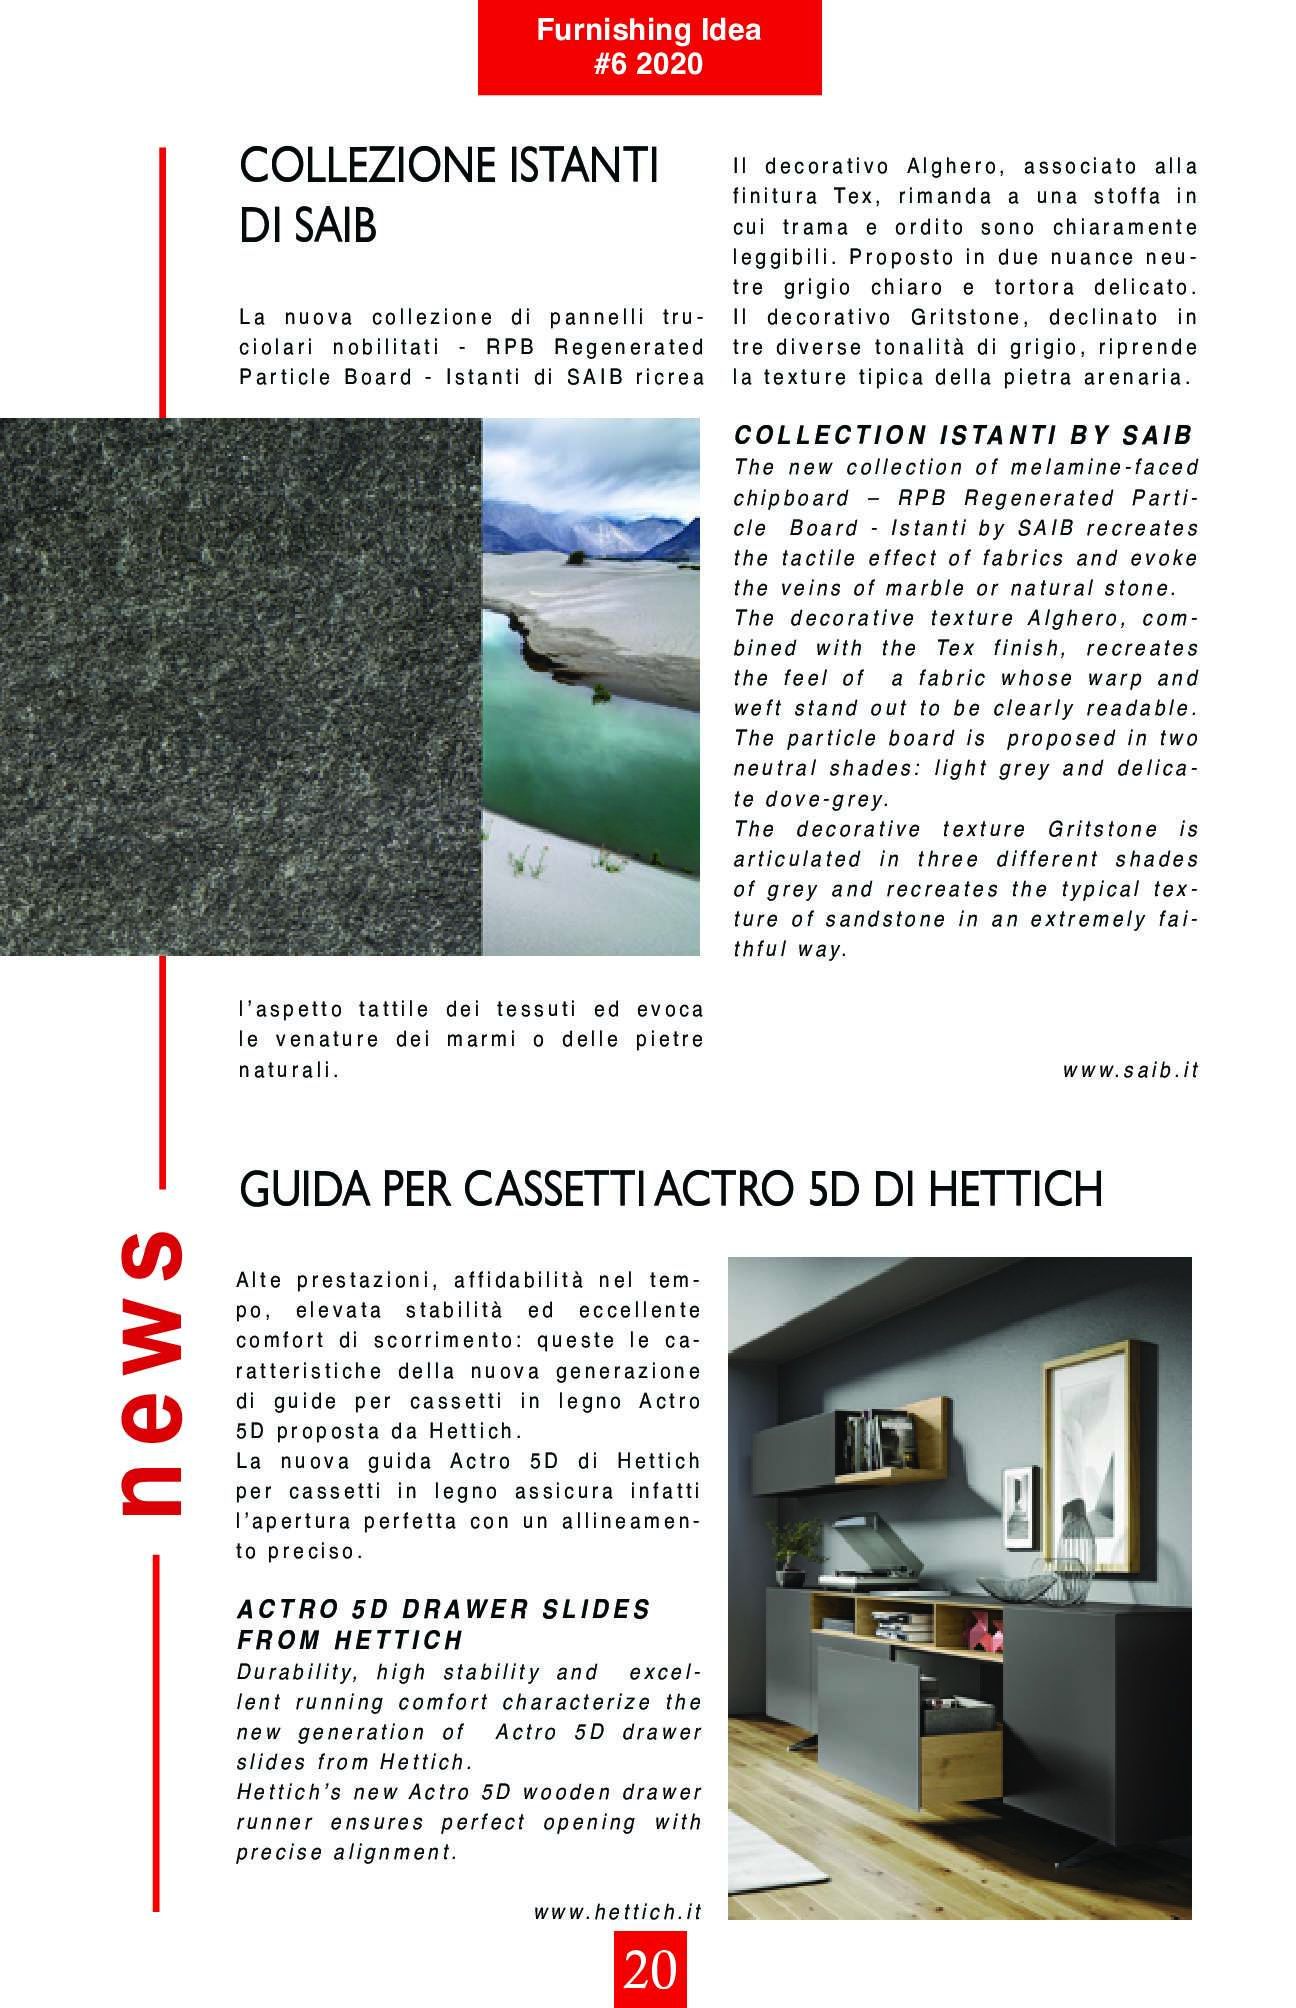 furnishingidea-6-2020_journal_22_019.jpg